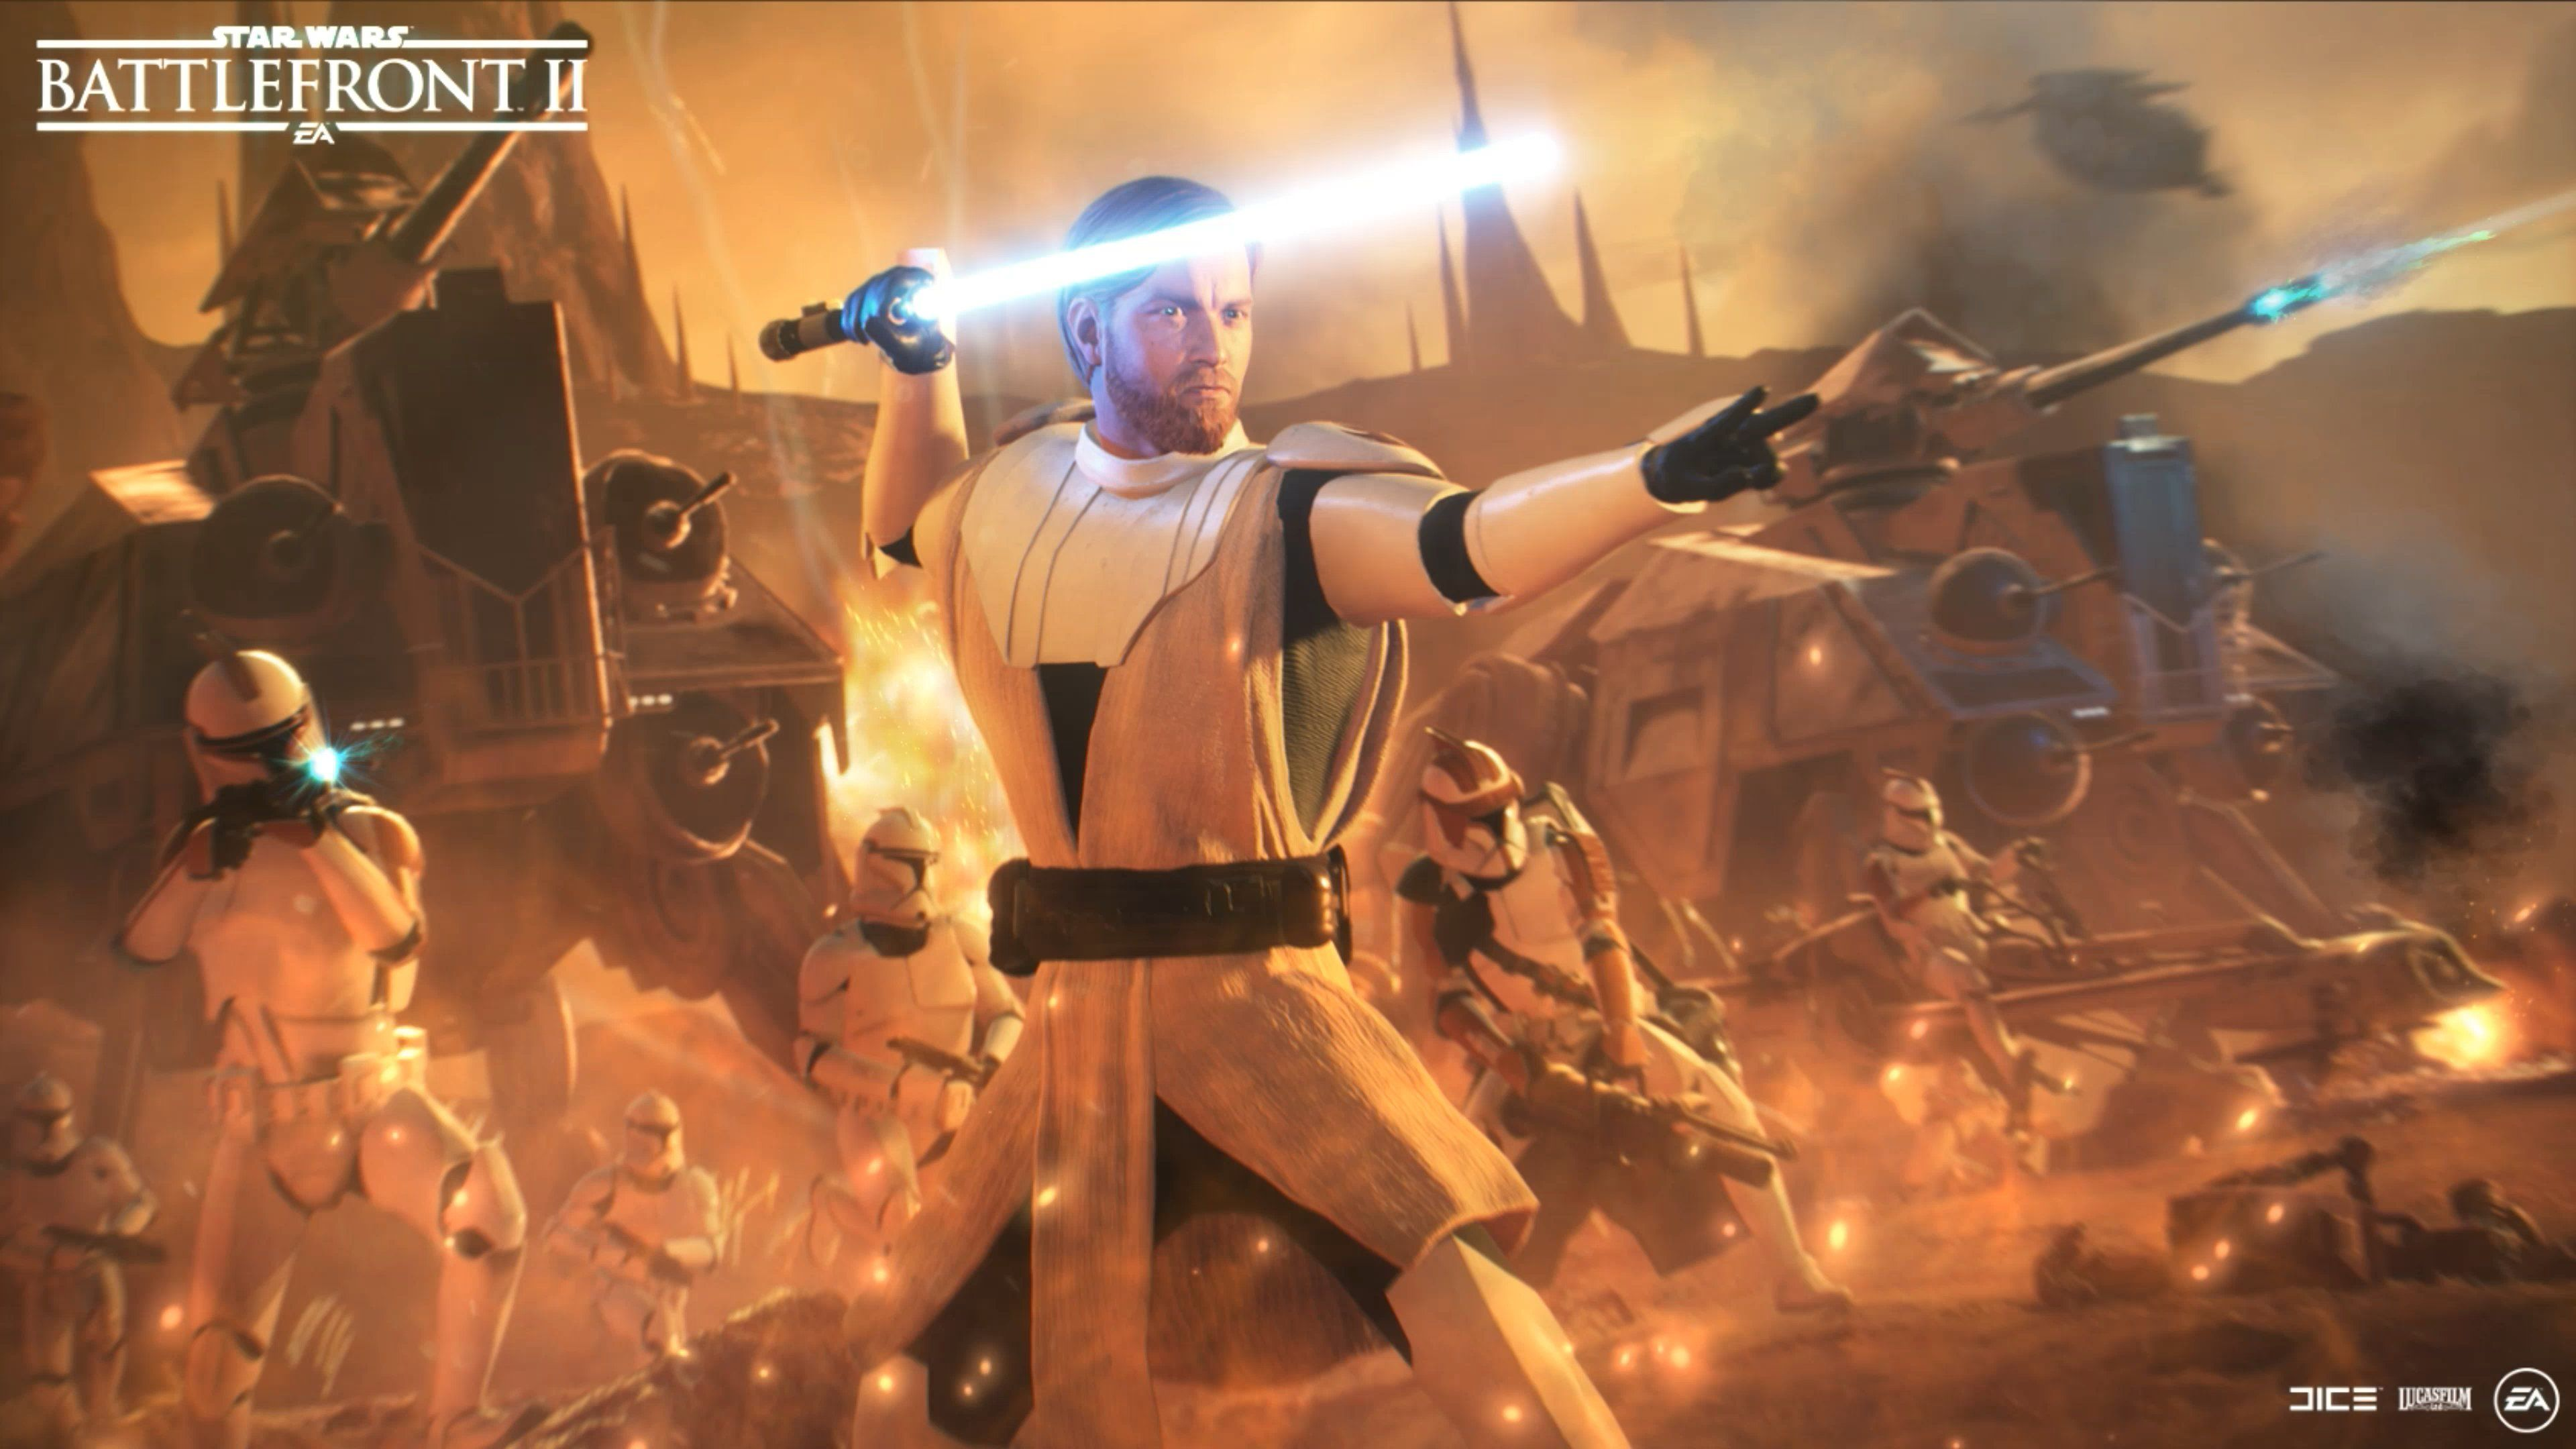 Obi Wan Kenobi General Kenobi Battlefront 2 3840x2160 Wallpaper Teahub Io